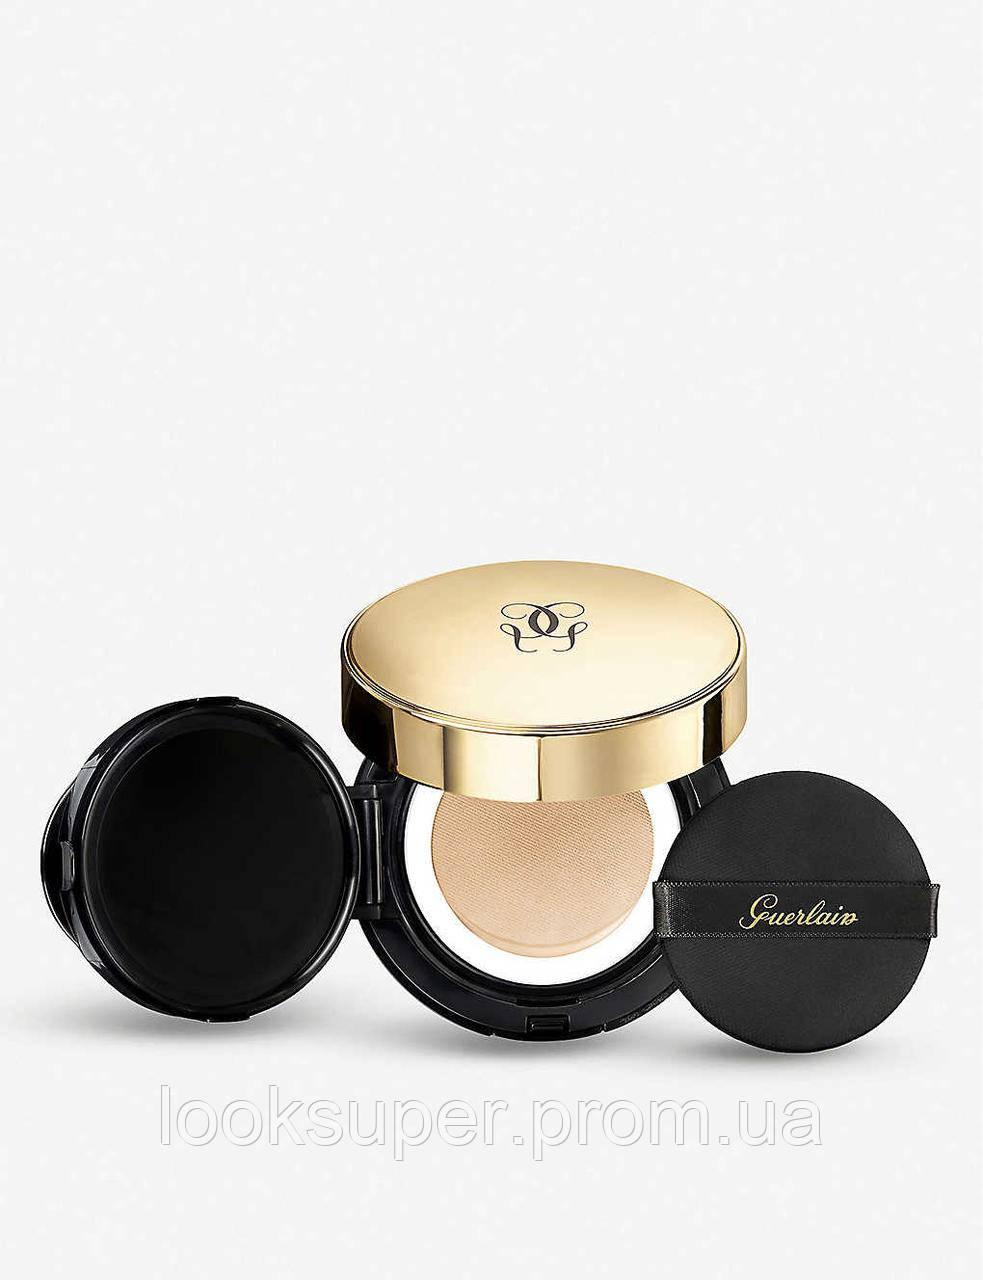 Основа под макияж Guerlain Parure Gold Radiance foundation SPF25 (15g)